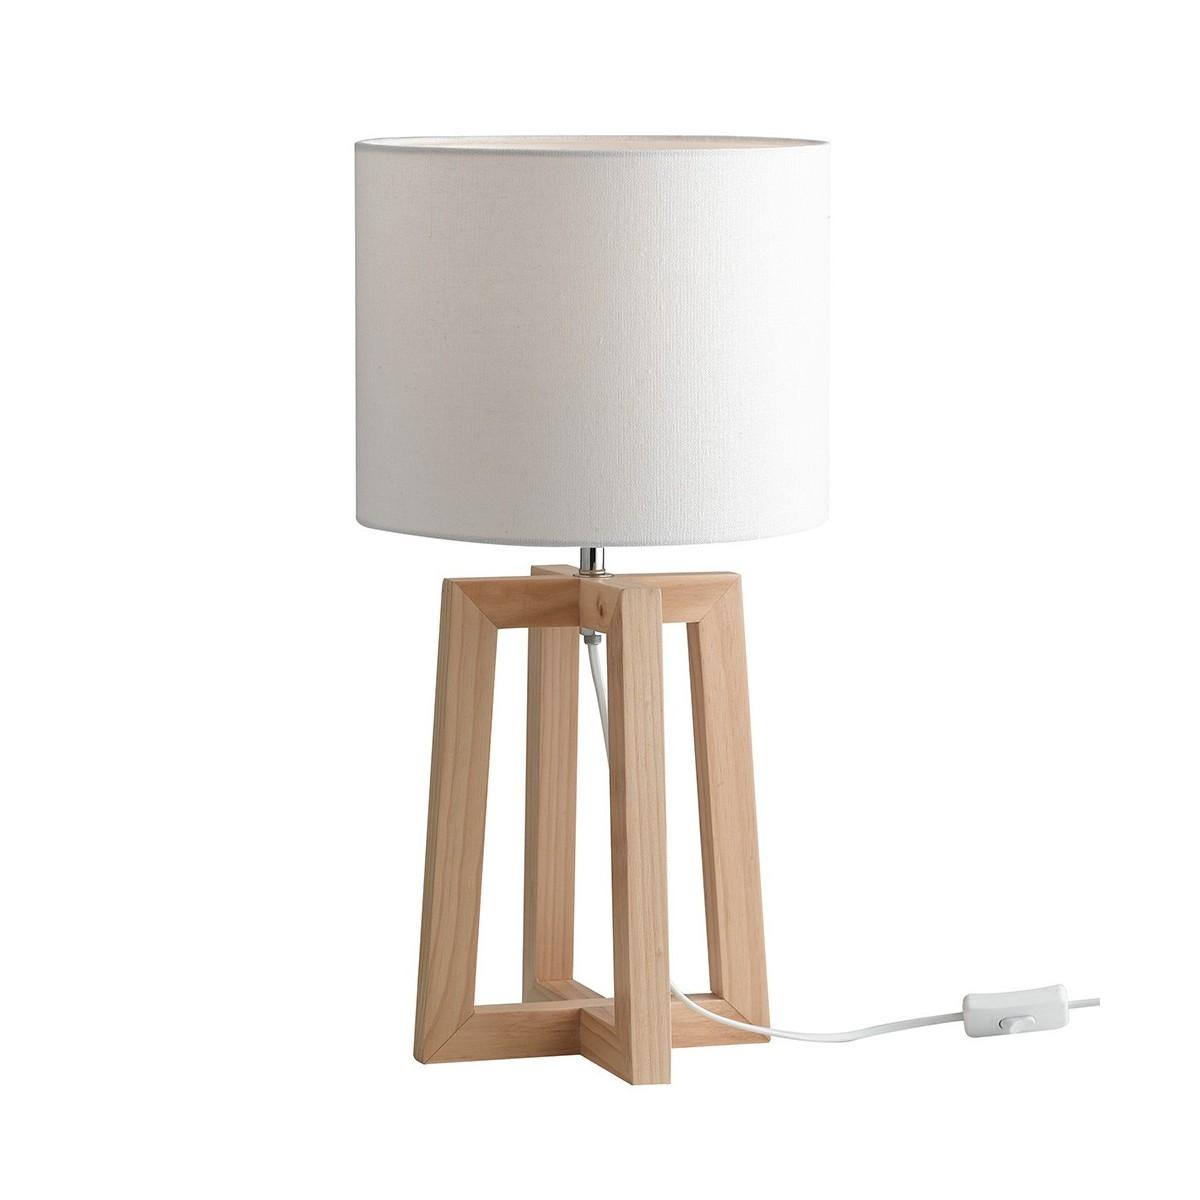 Lampada Da Scrivania Legno.I Berry L 8031440363792 Fan Europe Lighting Lume In Legno Naturale